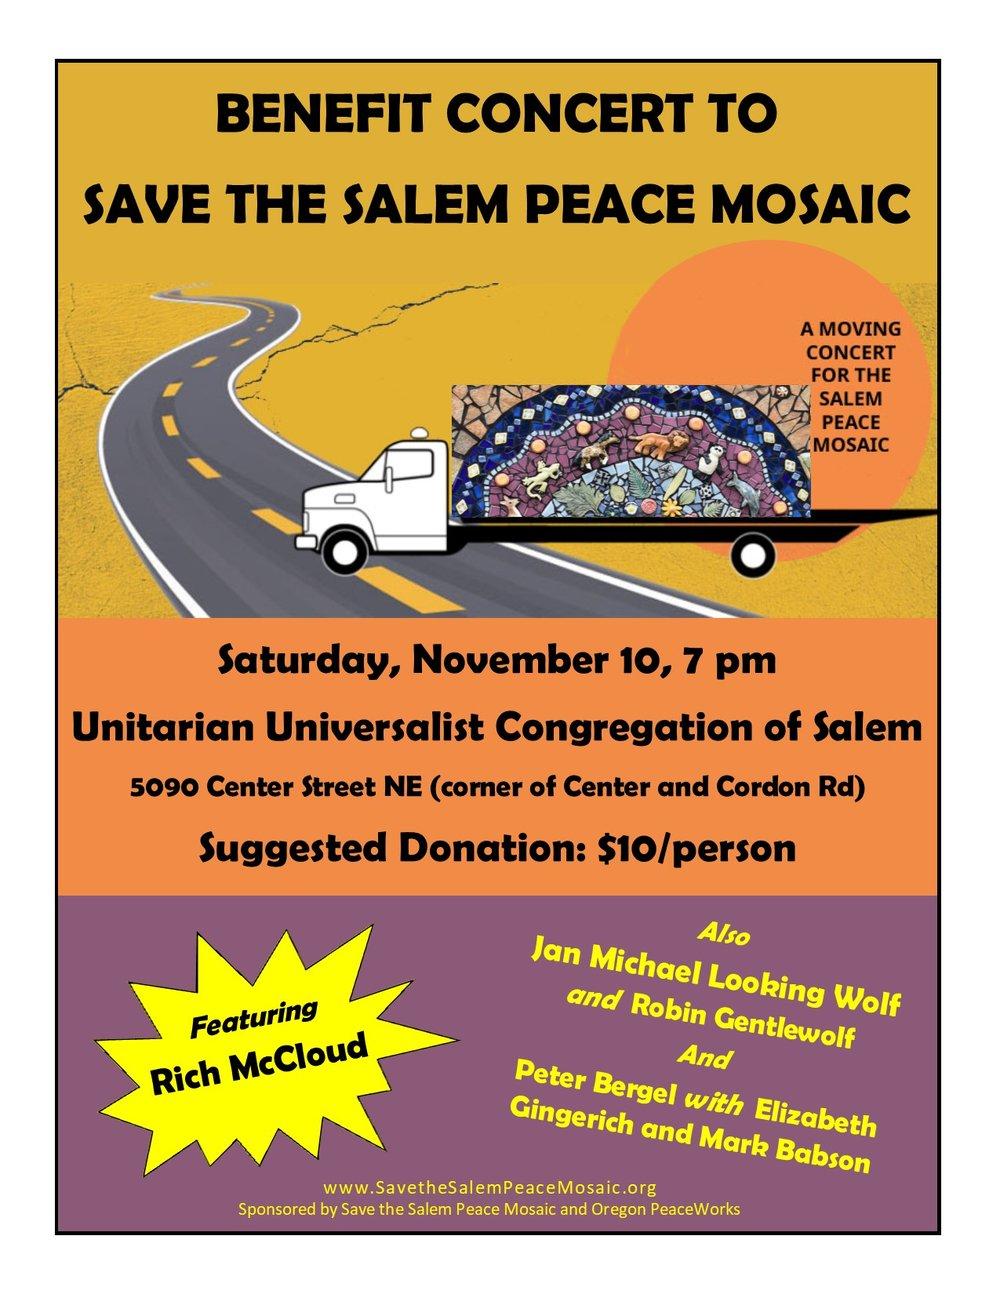 BENEFIT CONCERT TO SAVE THE SALEM PEACE MOSAIC